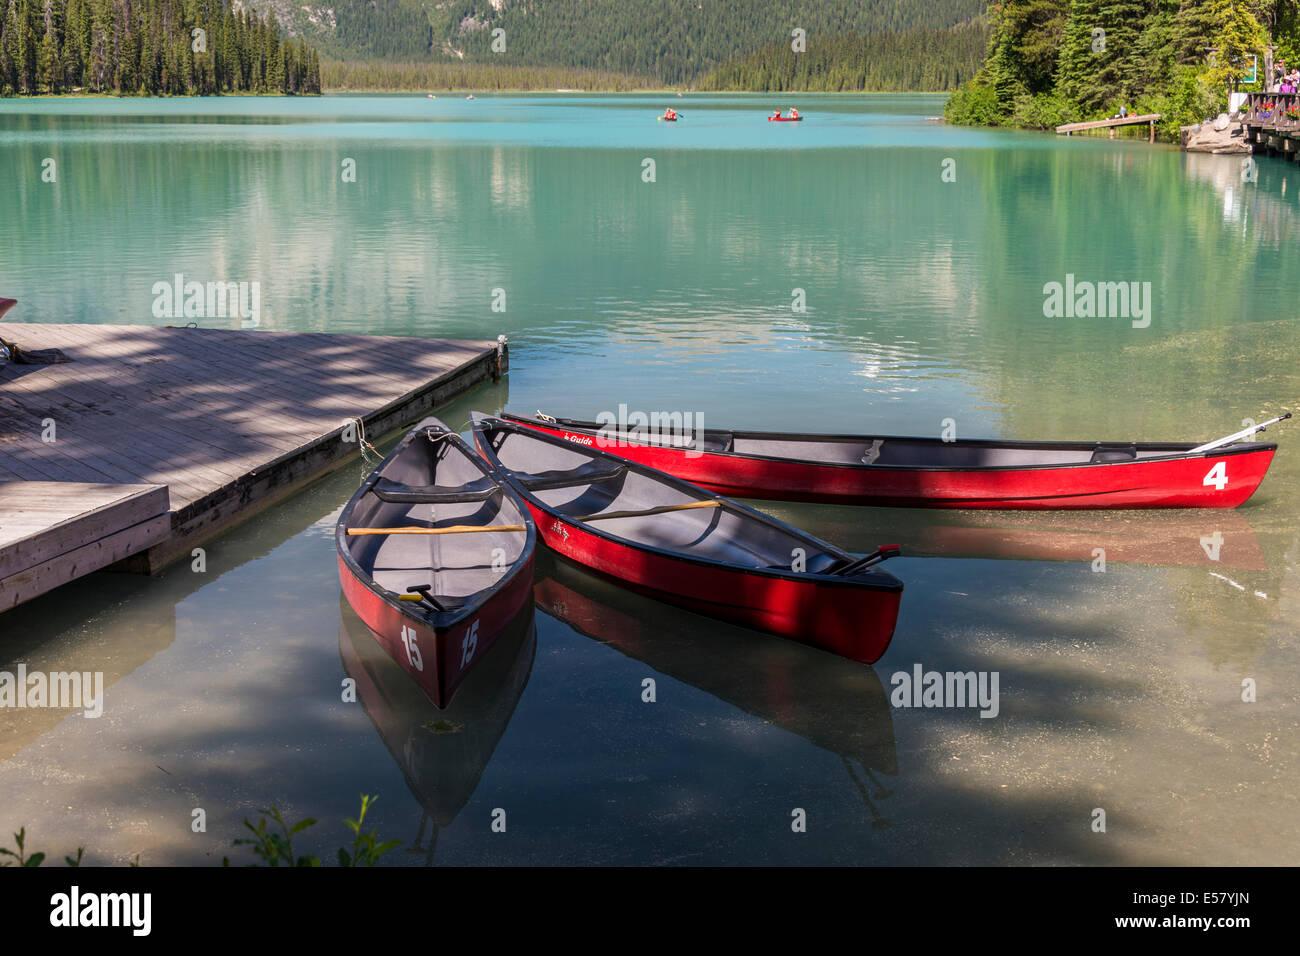 Canoeing in Emerald Lake - Stock Image